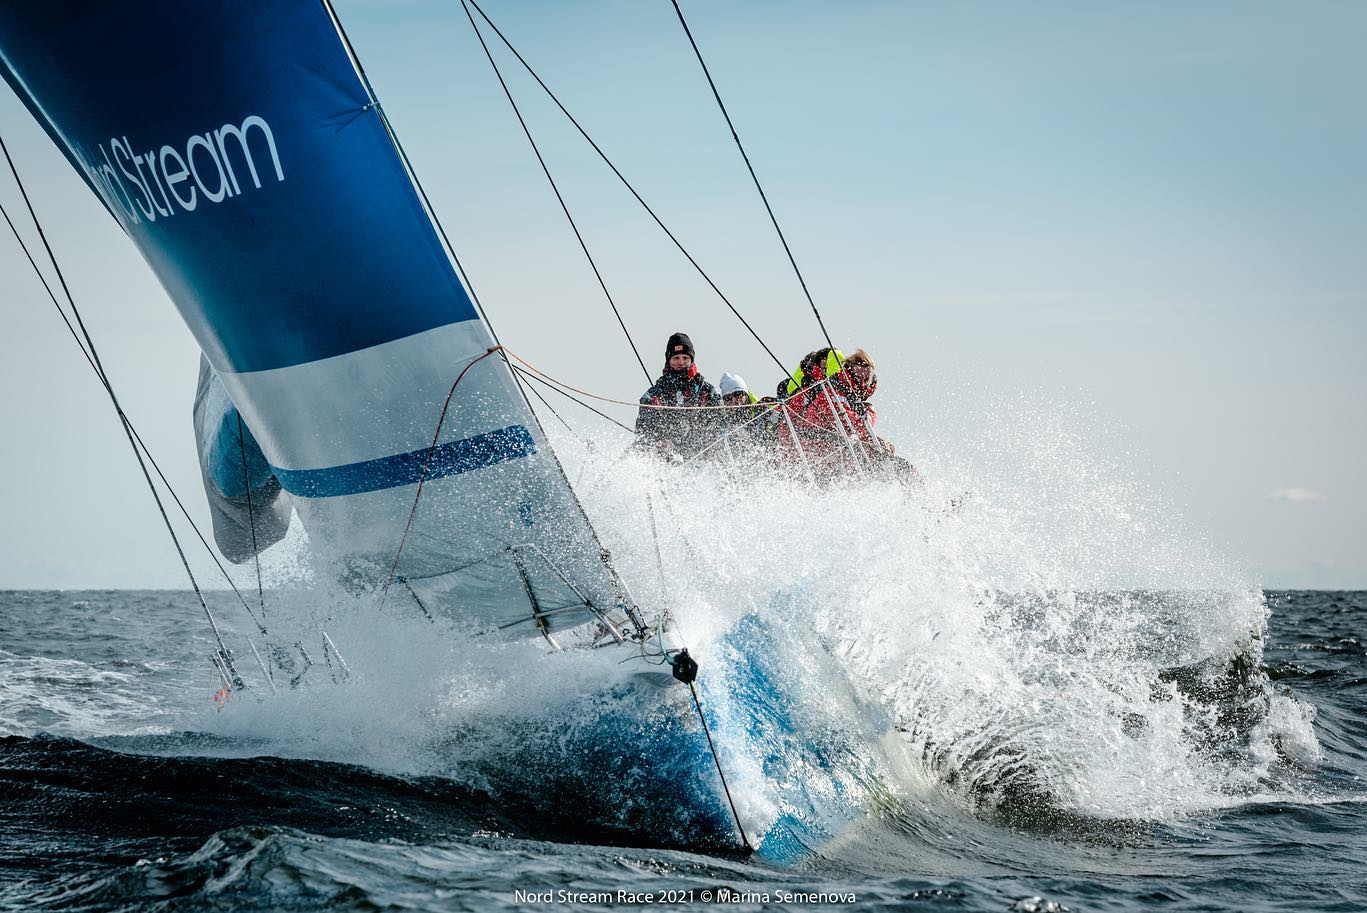 Finn boat sailing through chop, upwind.